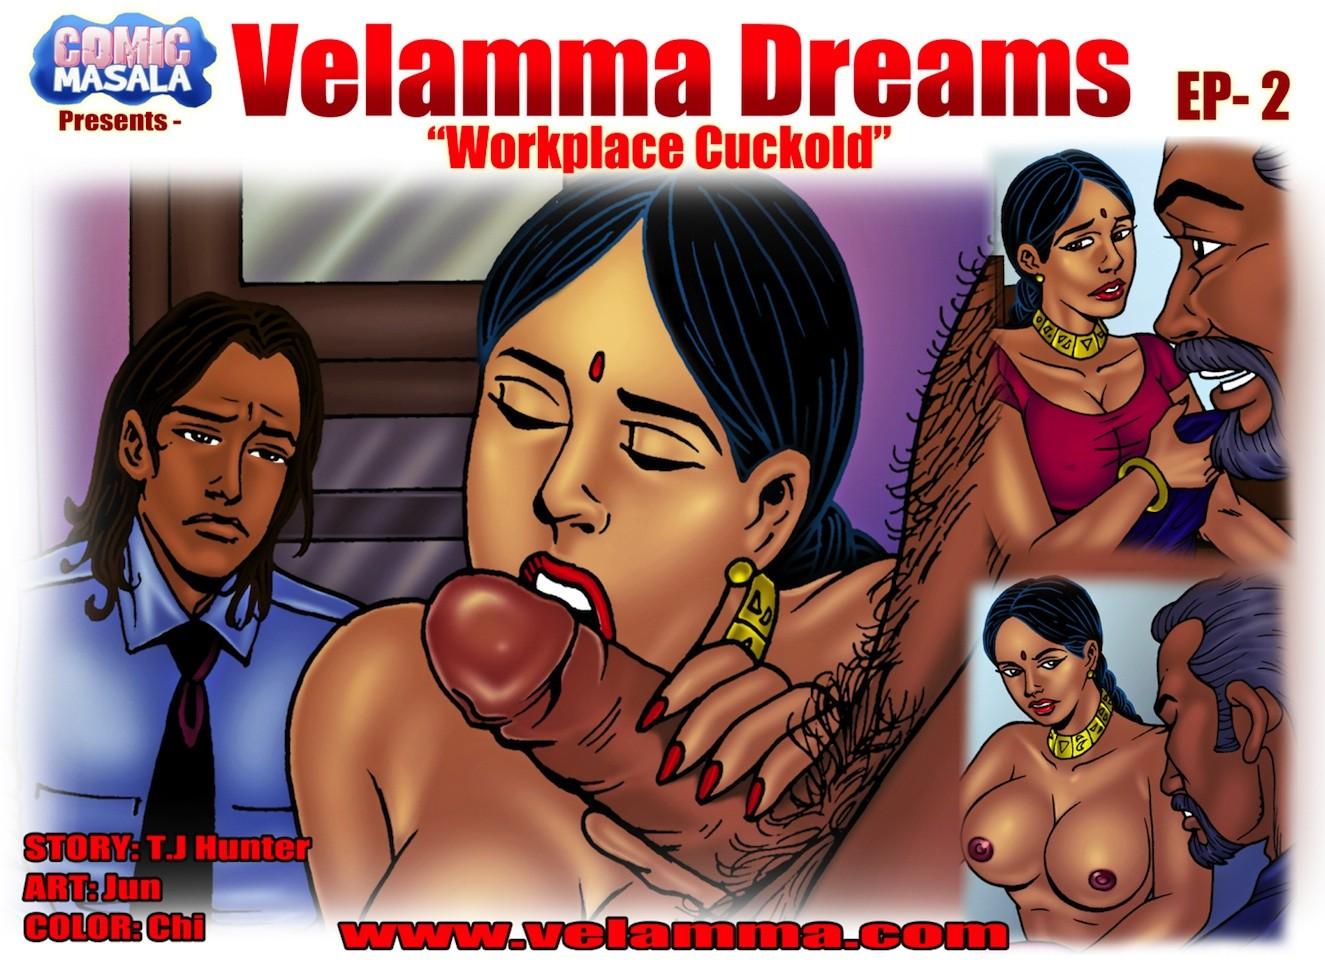 Velamma Dreams 2- Workplace Cuckold image 1